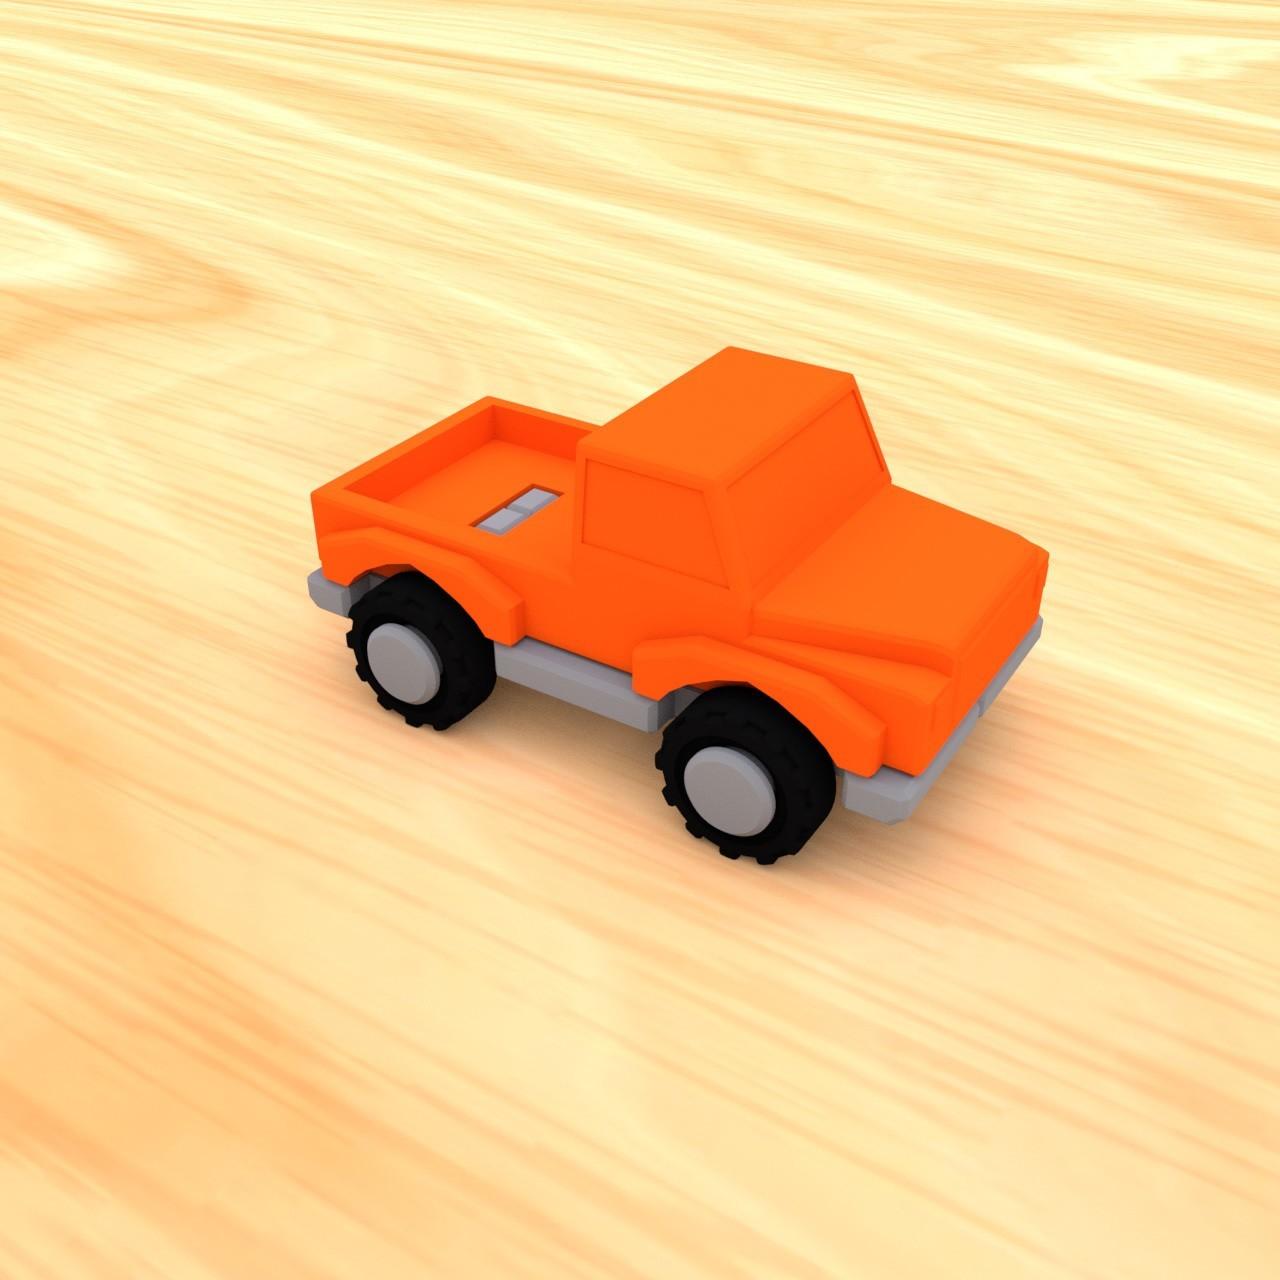 smalltoys-carspack08.jpg Download STL file SmallToys - Cars pack • 3D print design, Wabby